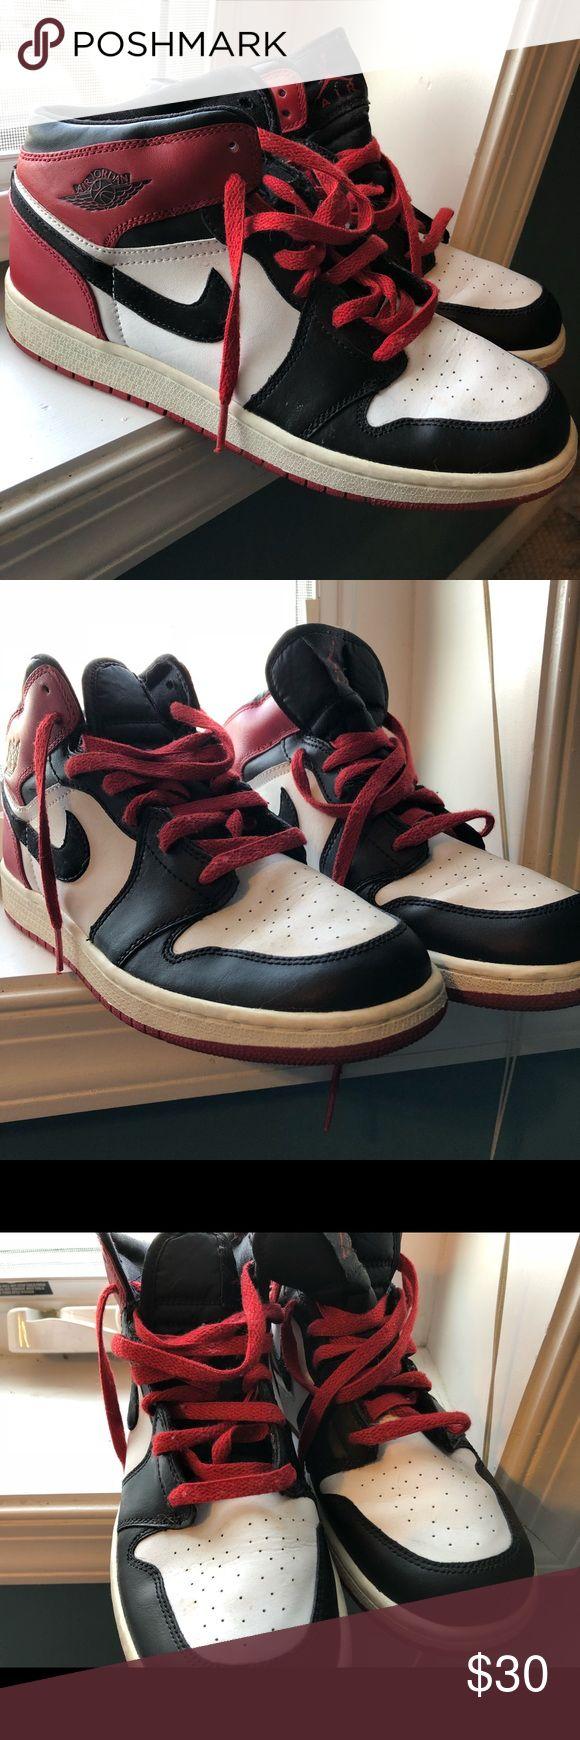 Retro Jordan 1s Retro Jordan 1s . Brought from footlocker . Just needs new laces . Air Jordan Shoes Sneakers